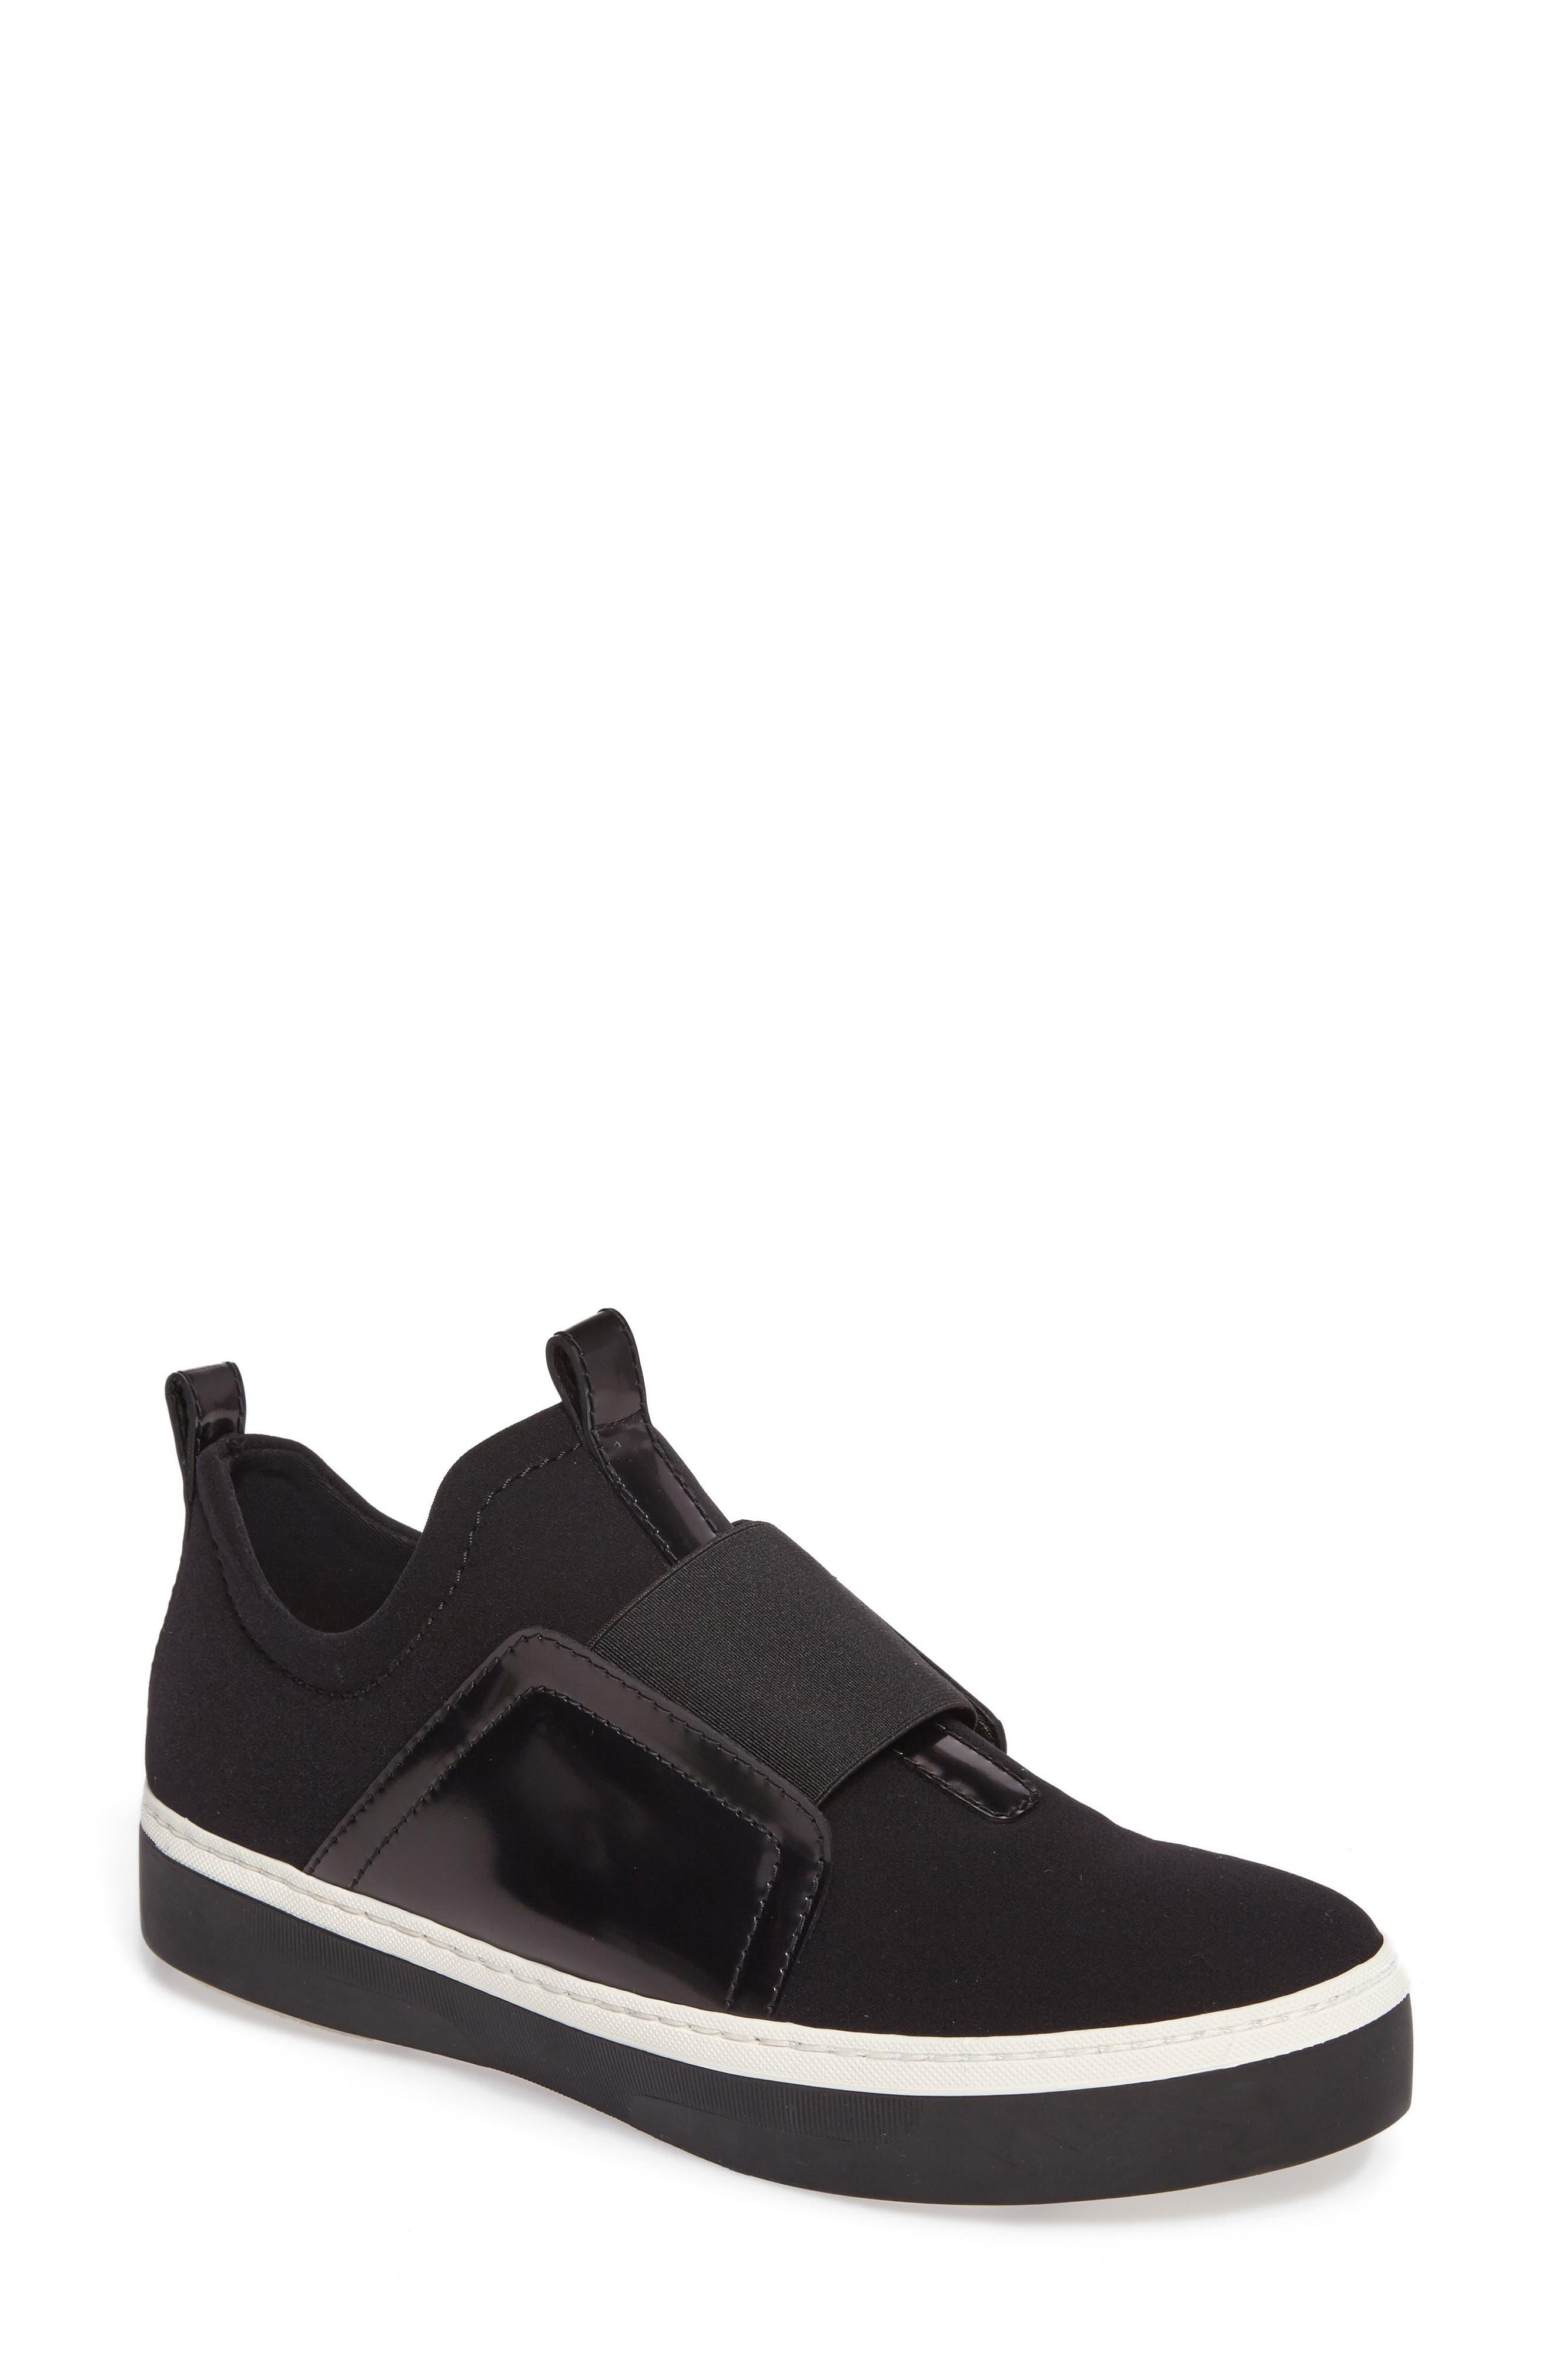 Wayfare Slip-On Sneaker,                             Main thumbnail 1, color,